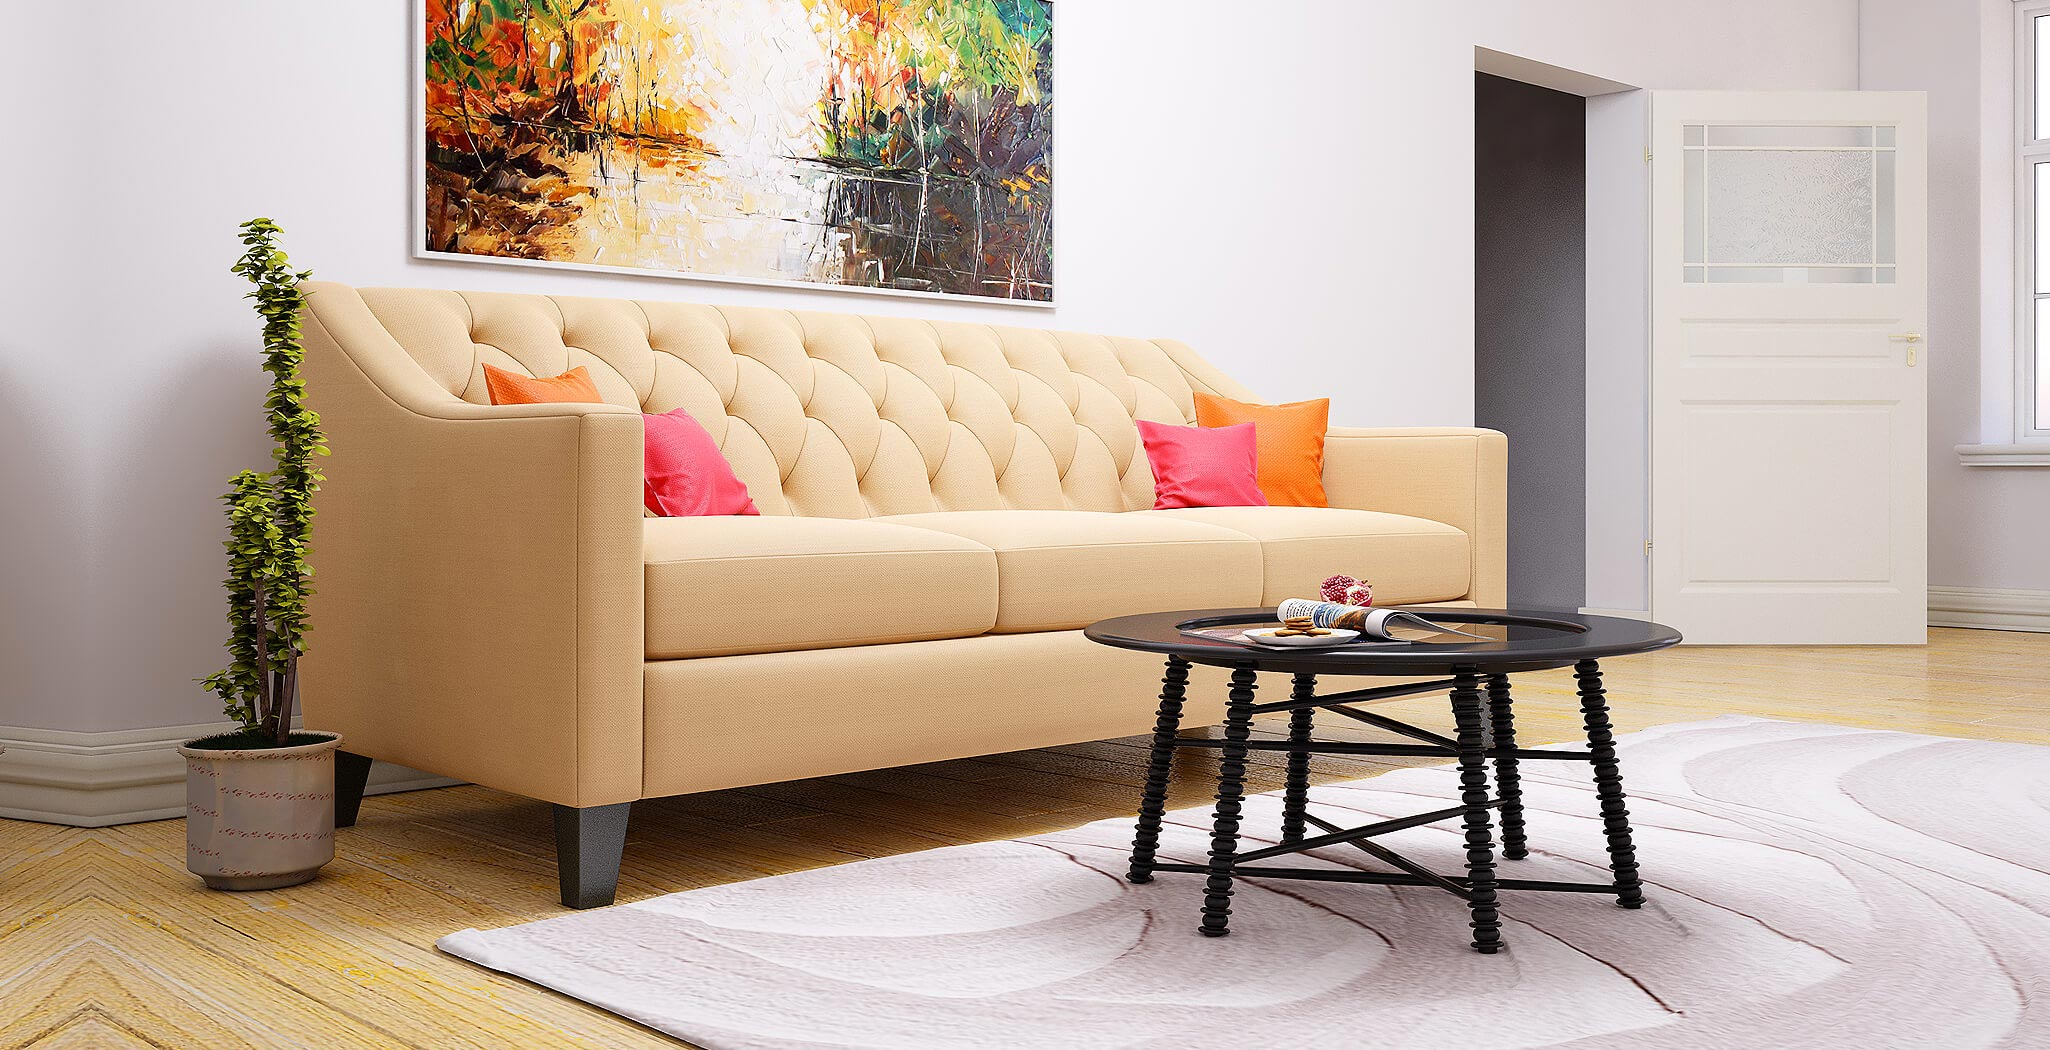 seville sofa furniture gallery 4